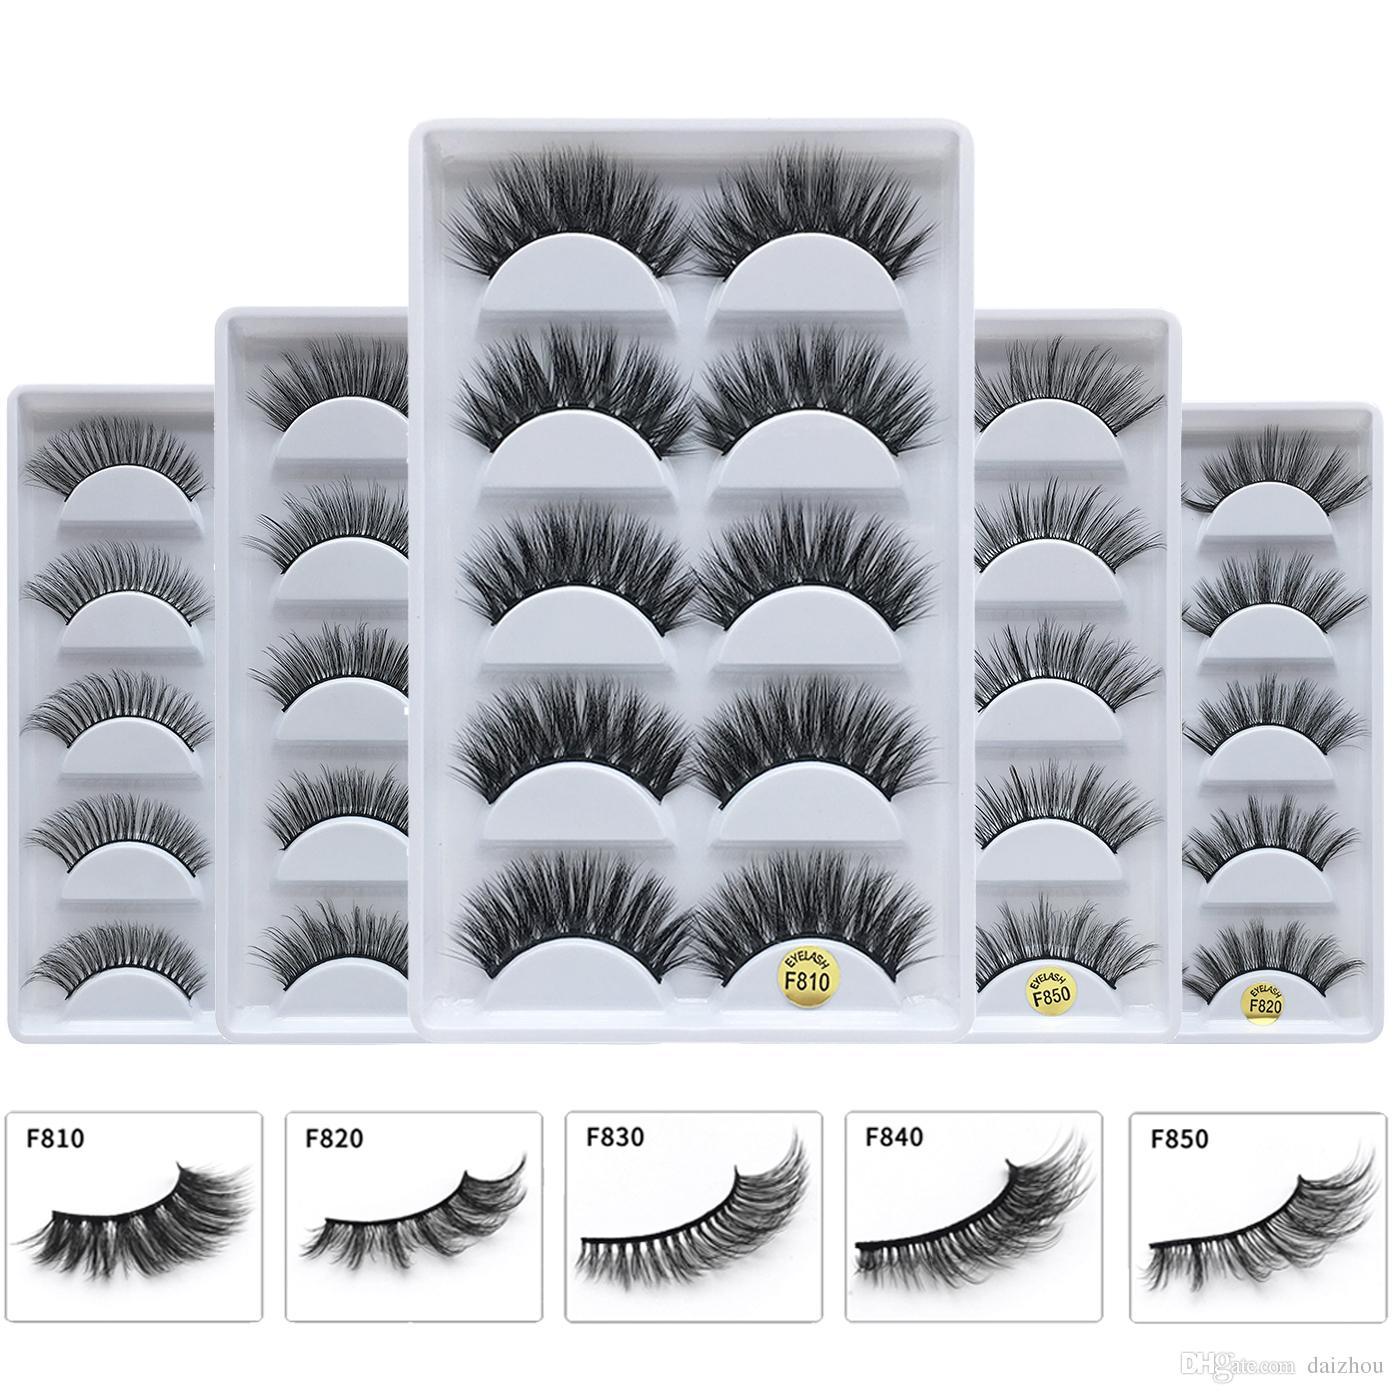 dedb66e6a0b 100% Real Mink Eyelashes 3D Natural False Eyelashes 3d Mink Lashes ...